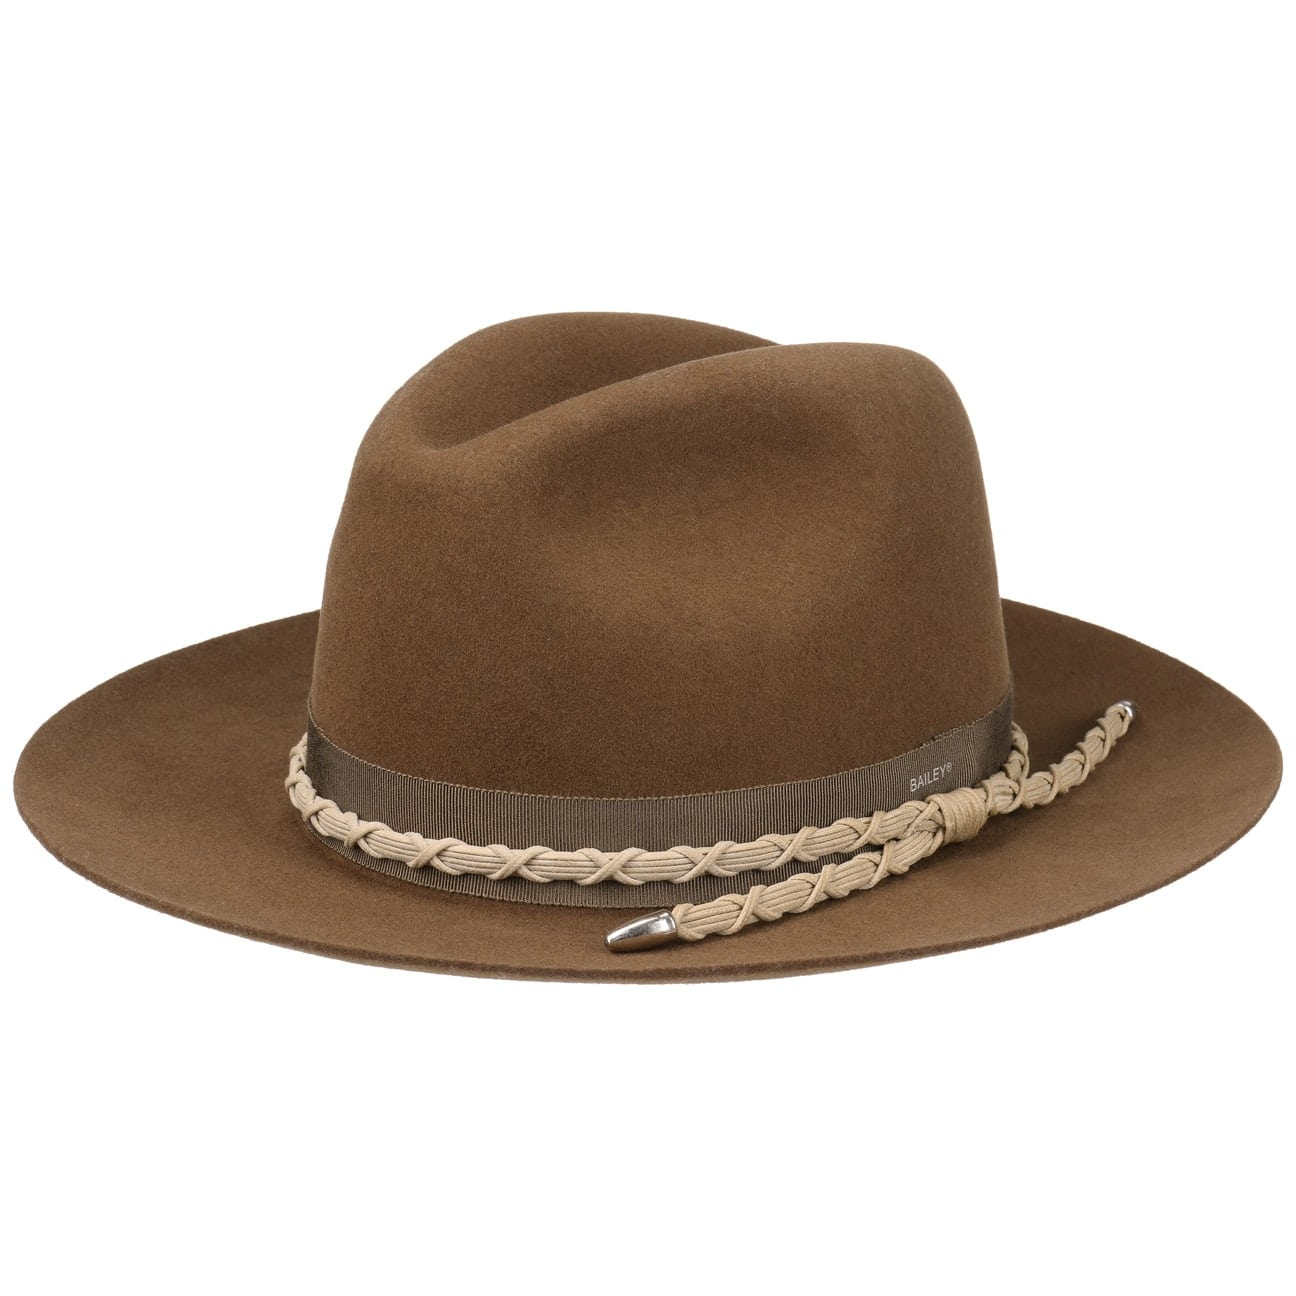 Sombrero de Lana Bartham by Bailey of Hollywood  sombrero de hombre